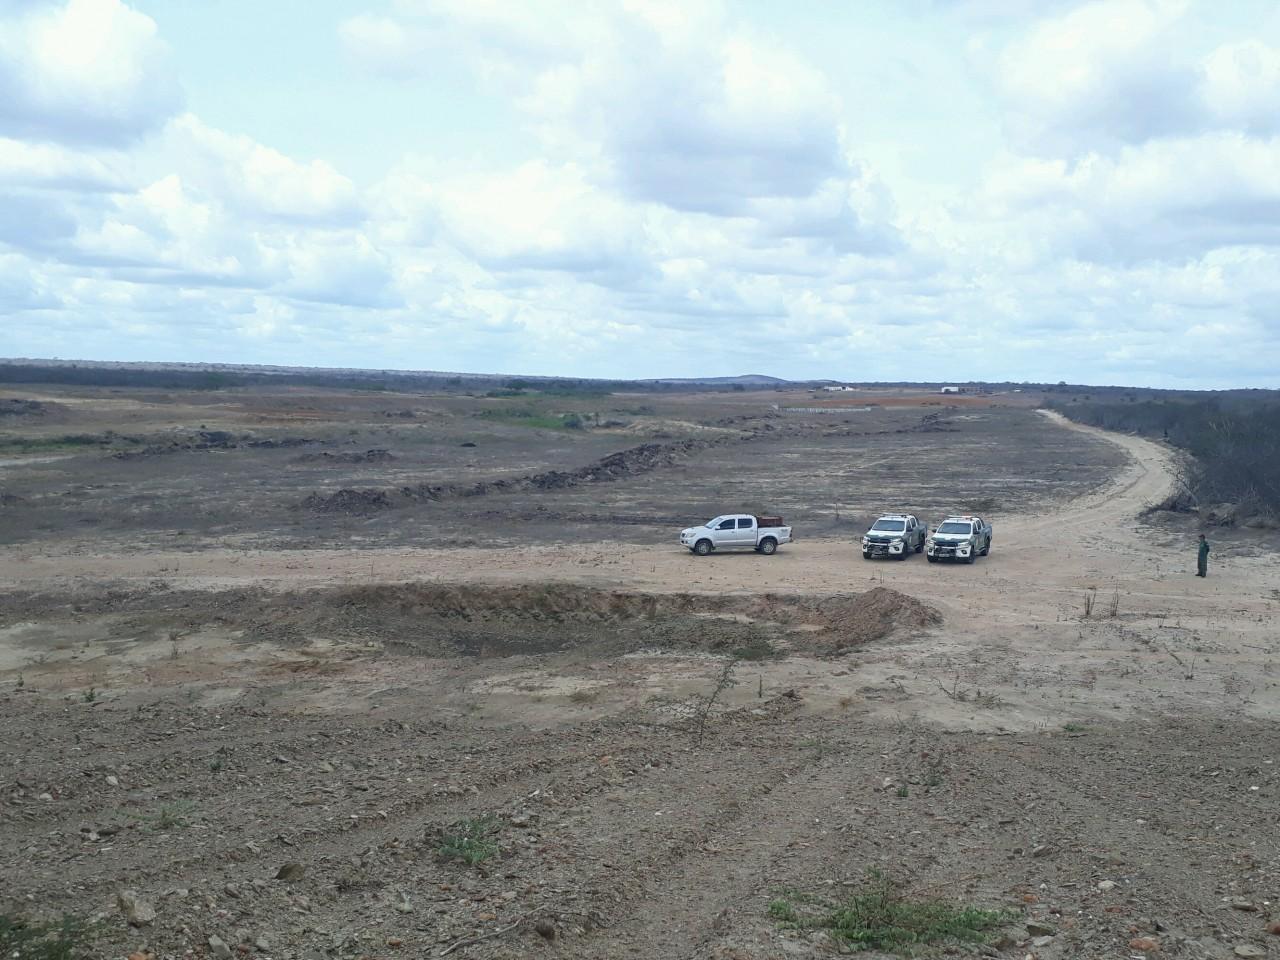 IBAMA detecta 287 hectares de área desmatada no bioma caatinga na Paraíba